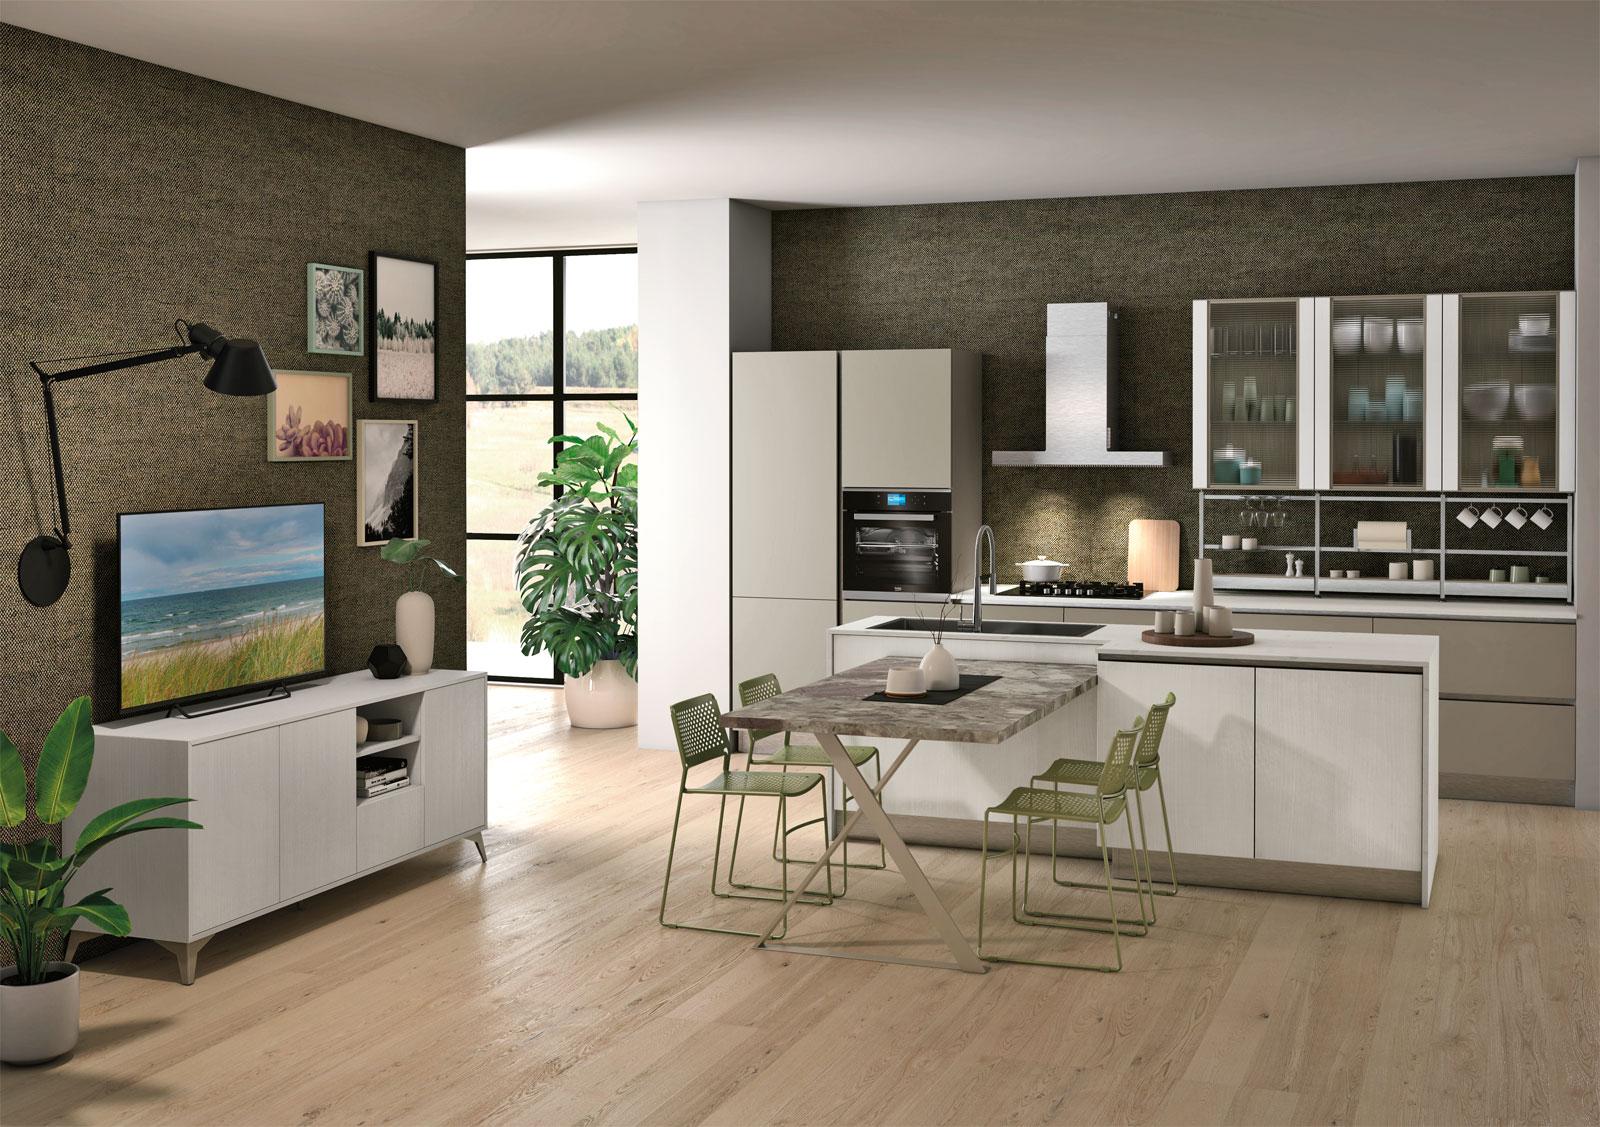 Creo tablet mobilia group divani cucine e camerette for Mobilia cucine